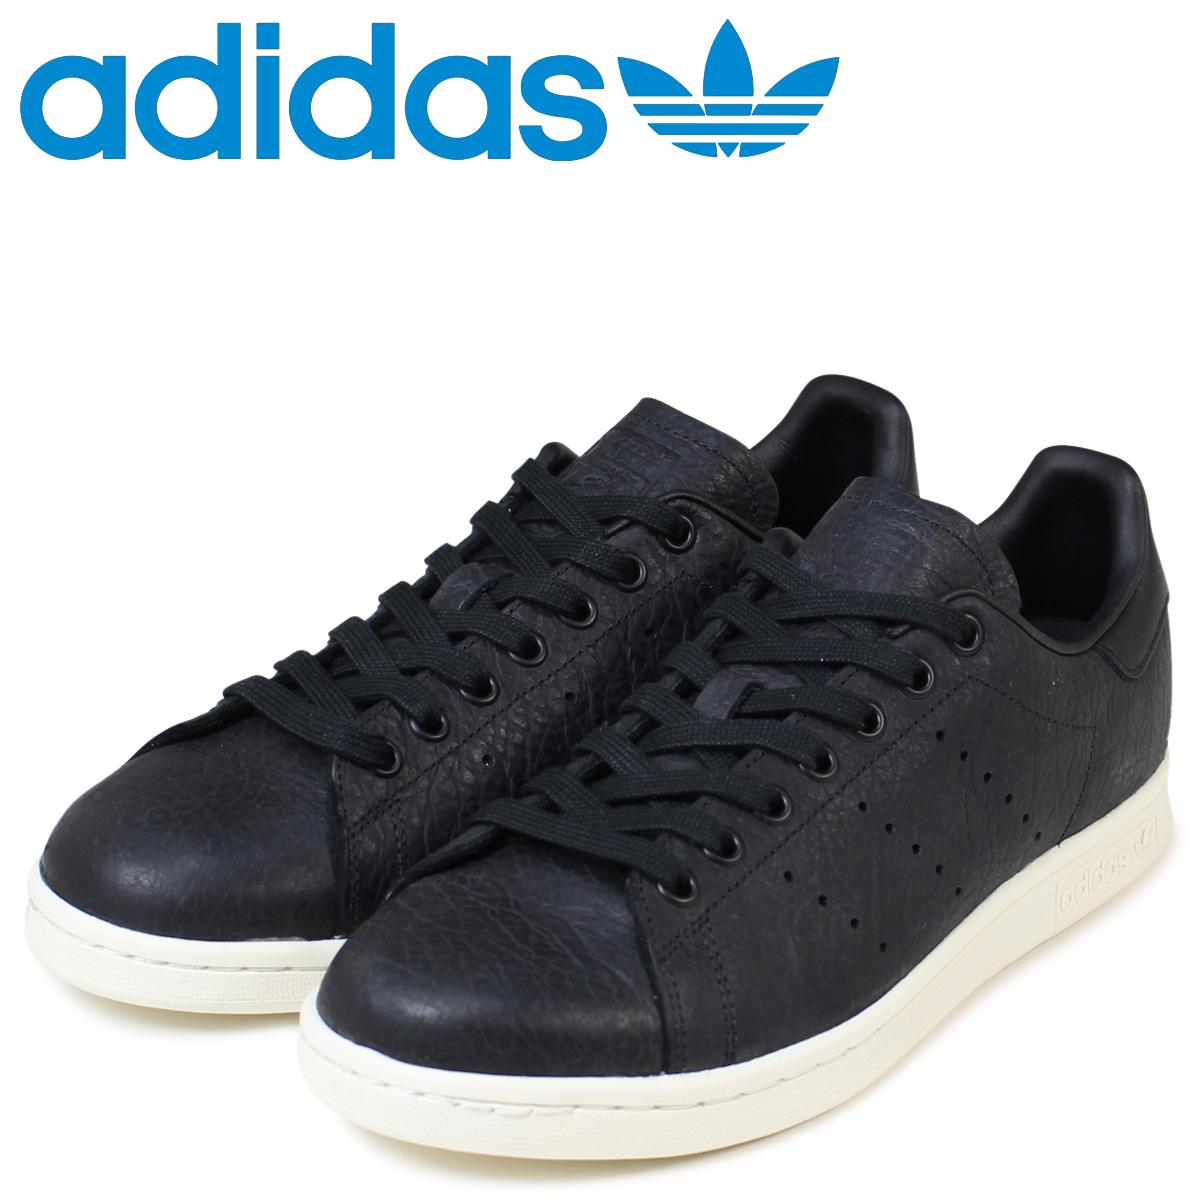 Adidas Stan Smith adidas originals sneakers STAN SMITH men BB0037 shoes  black [1/17